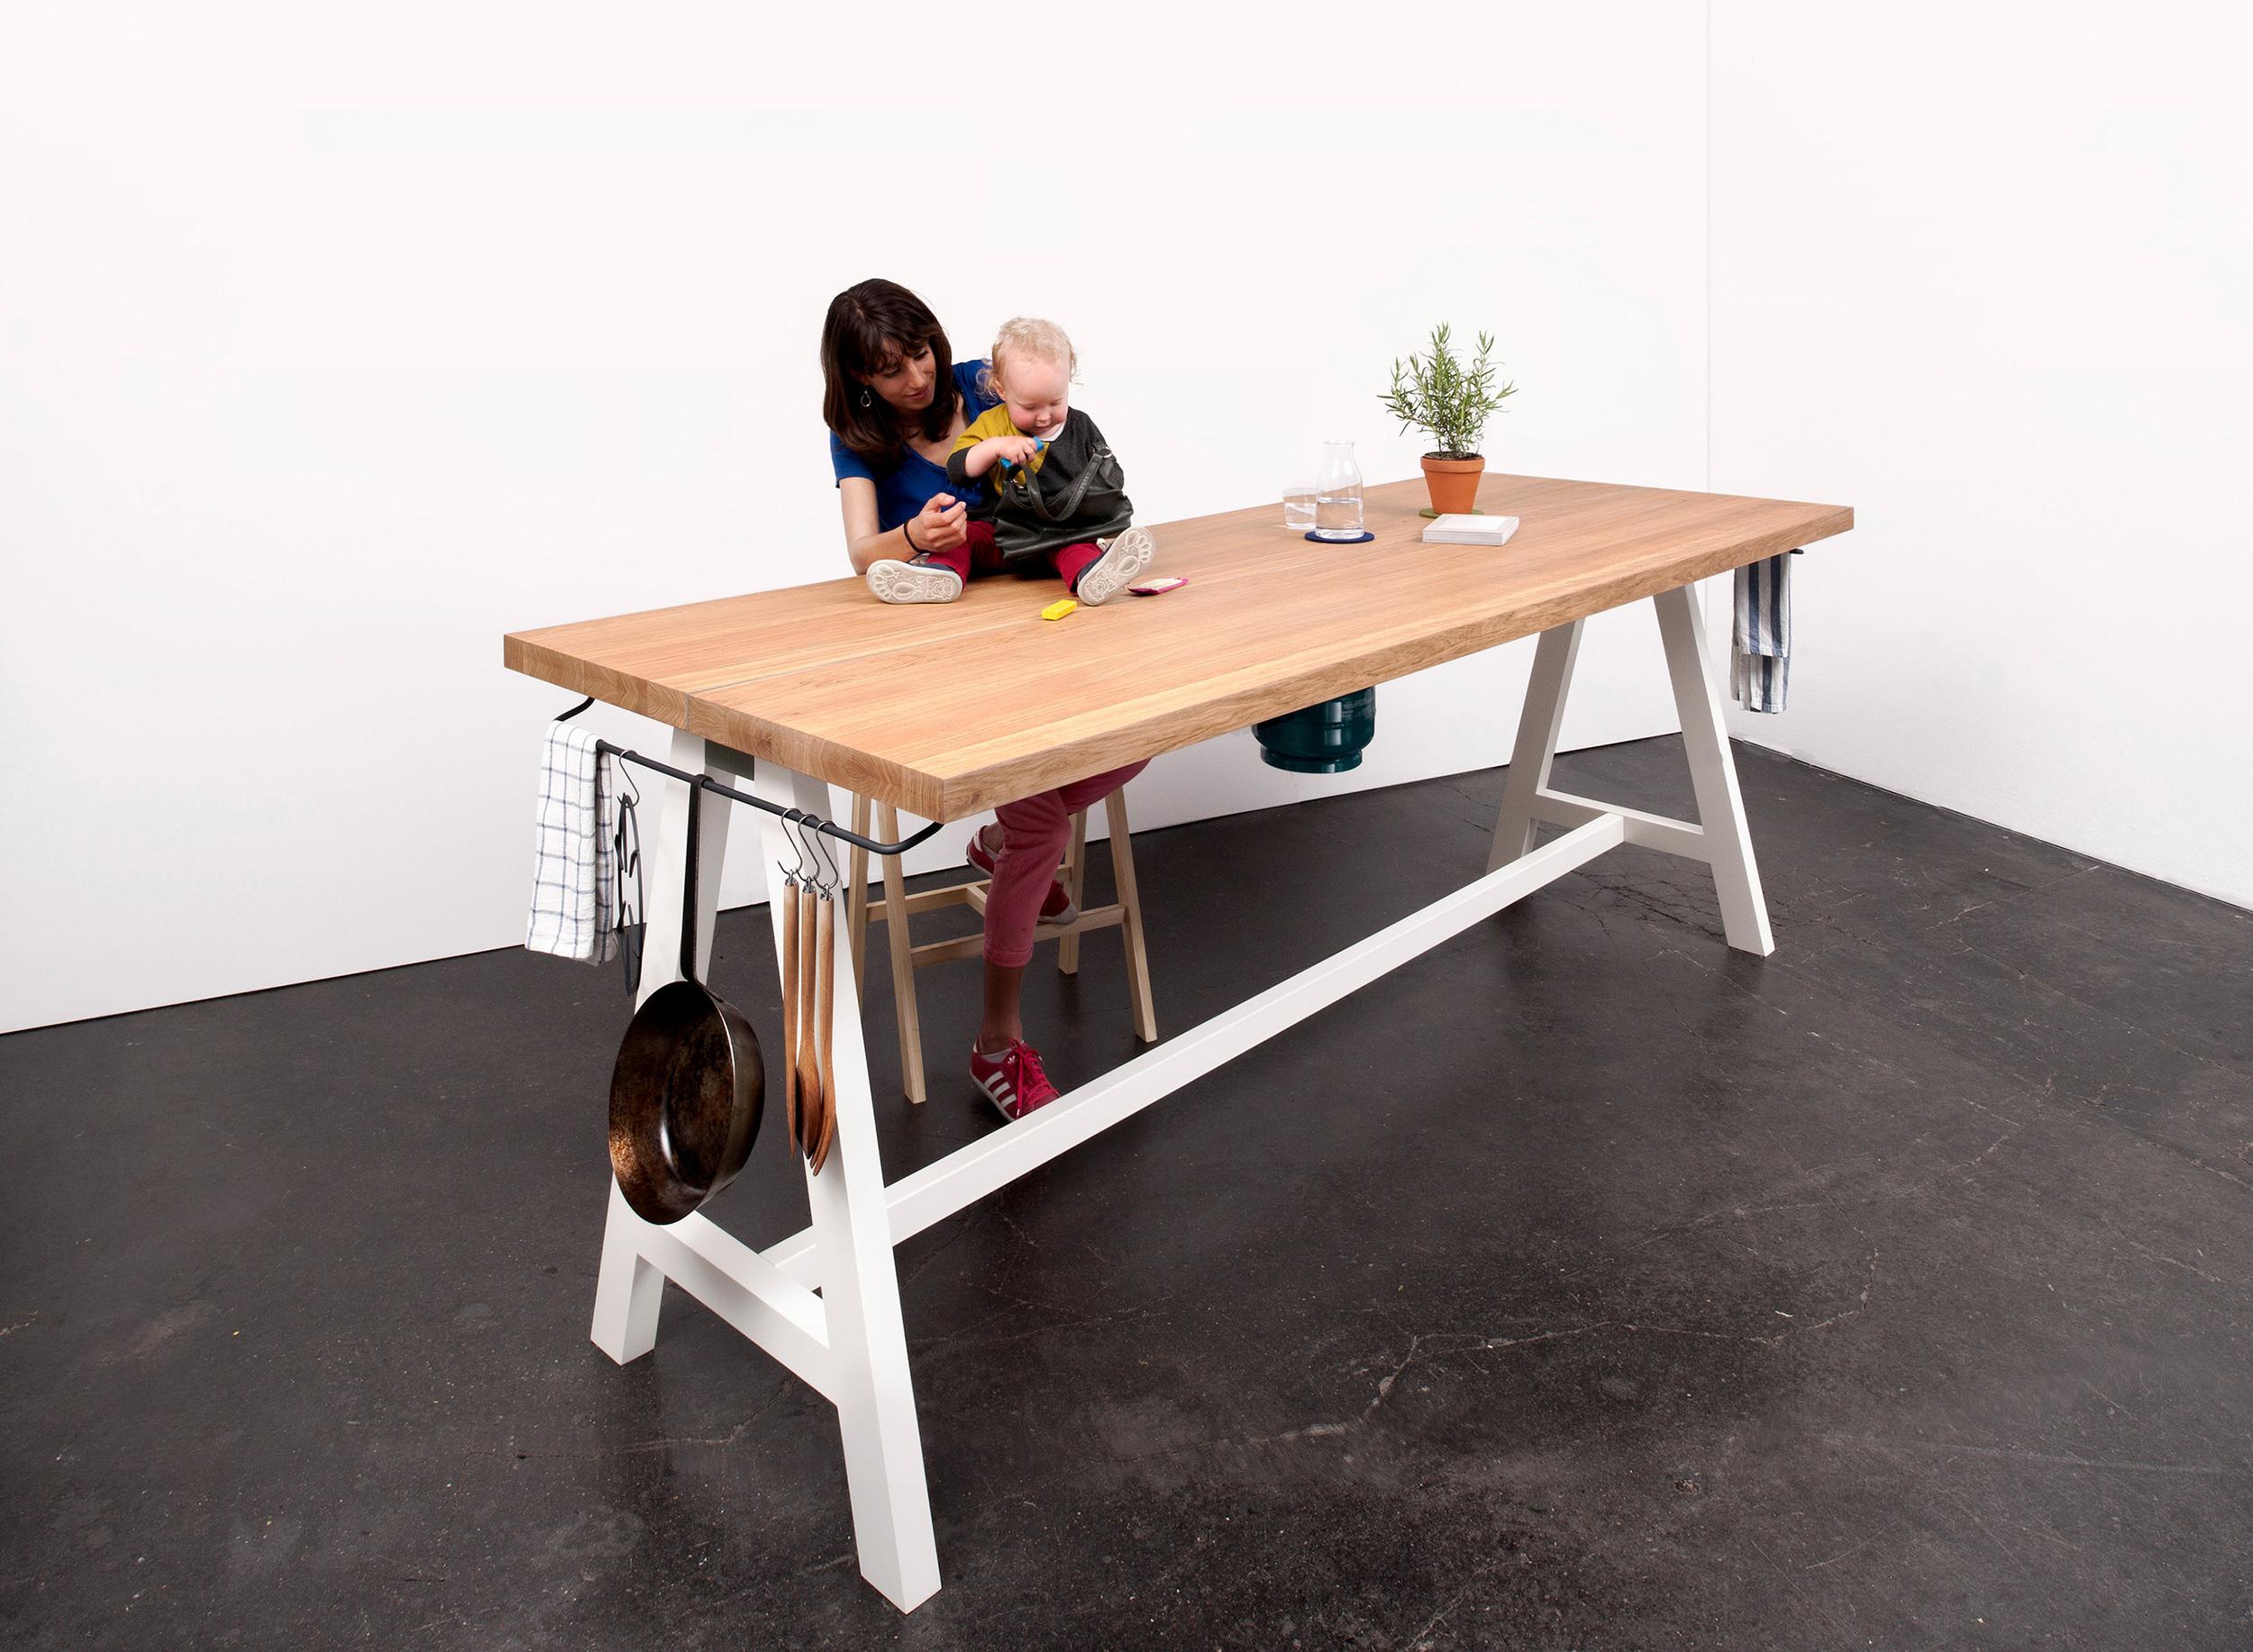 Studio-MoritzPutzier_The-Cooking-Table-17jpg.jpg